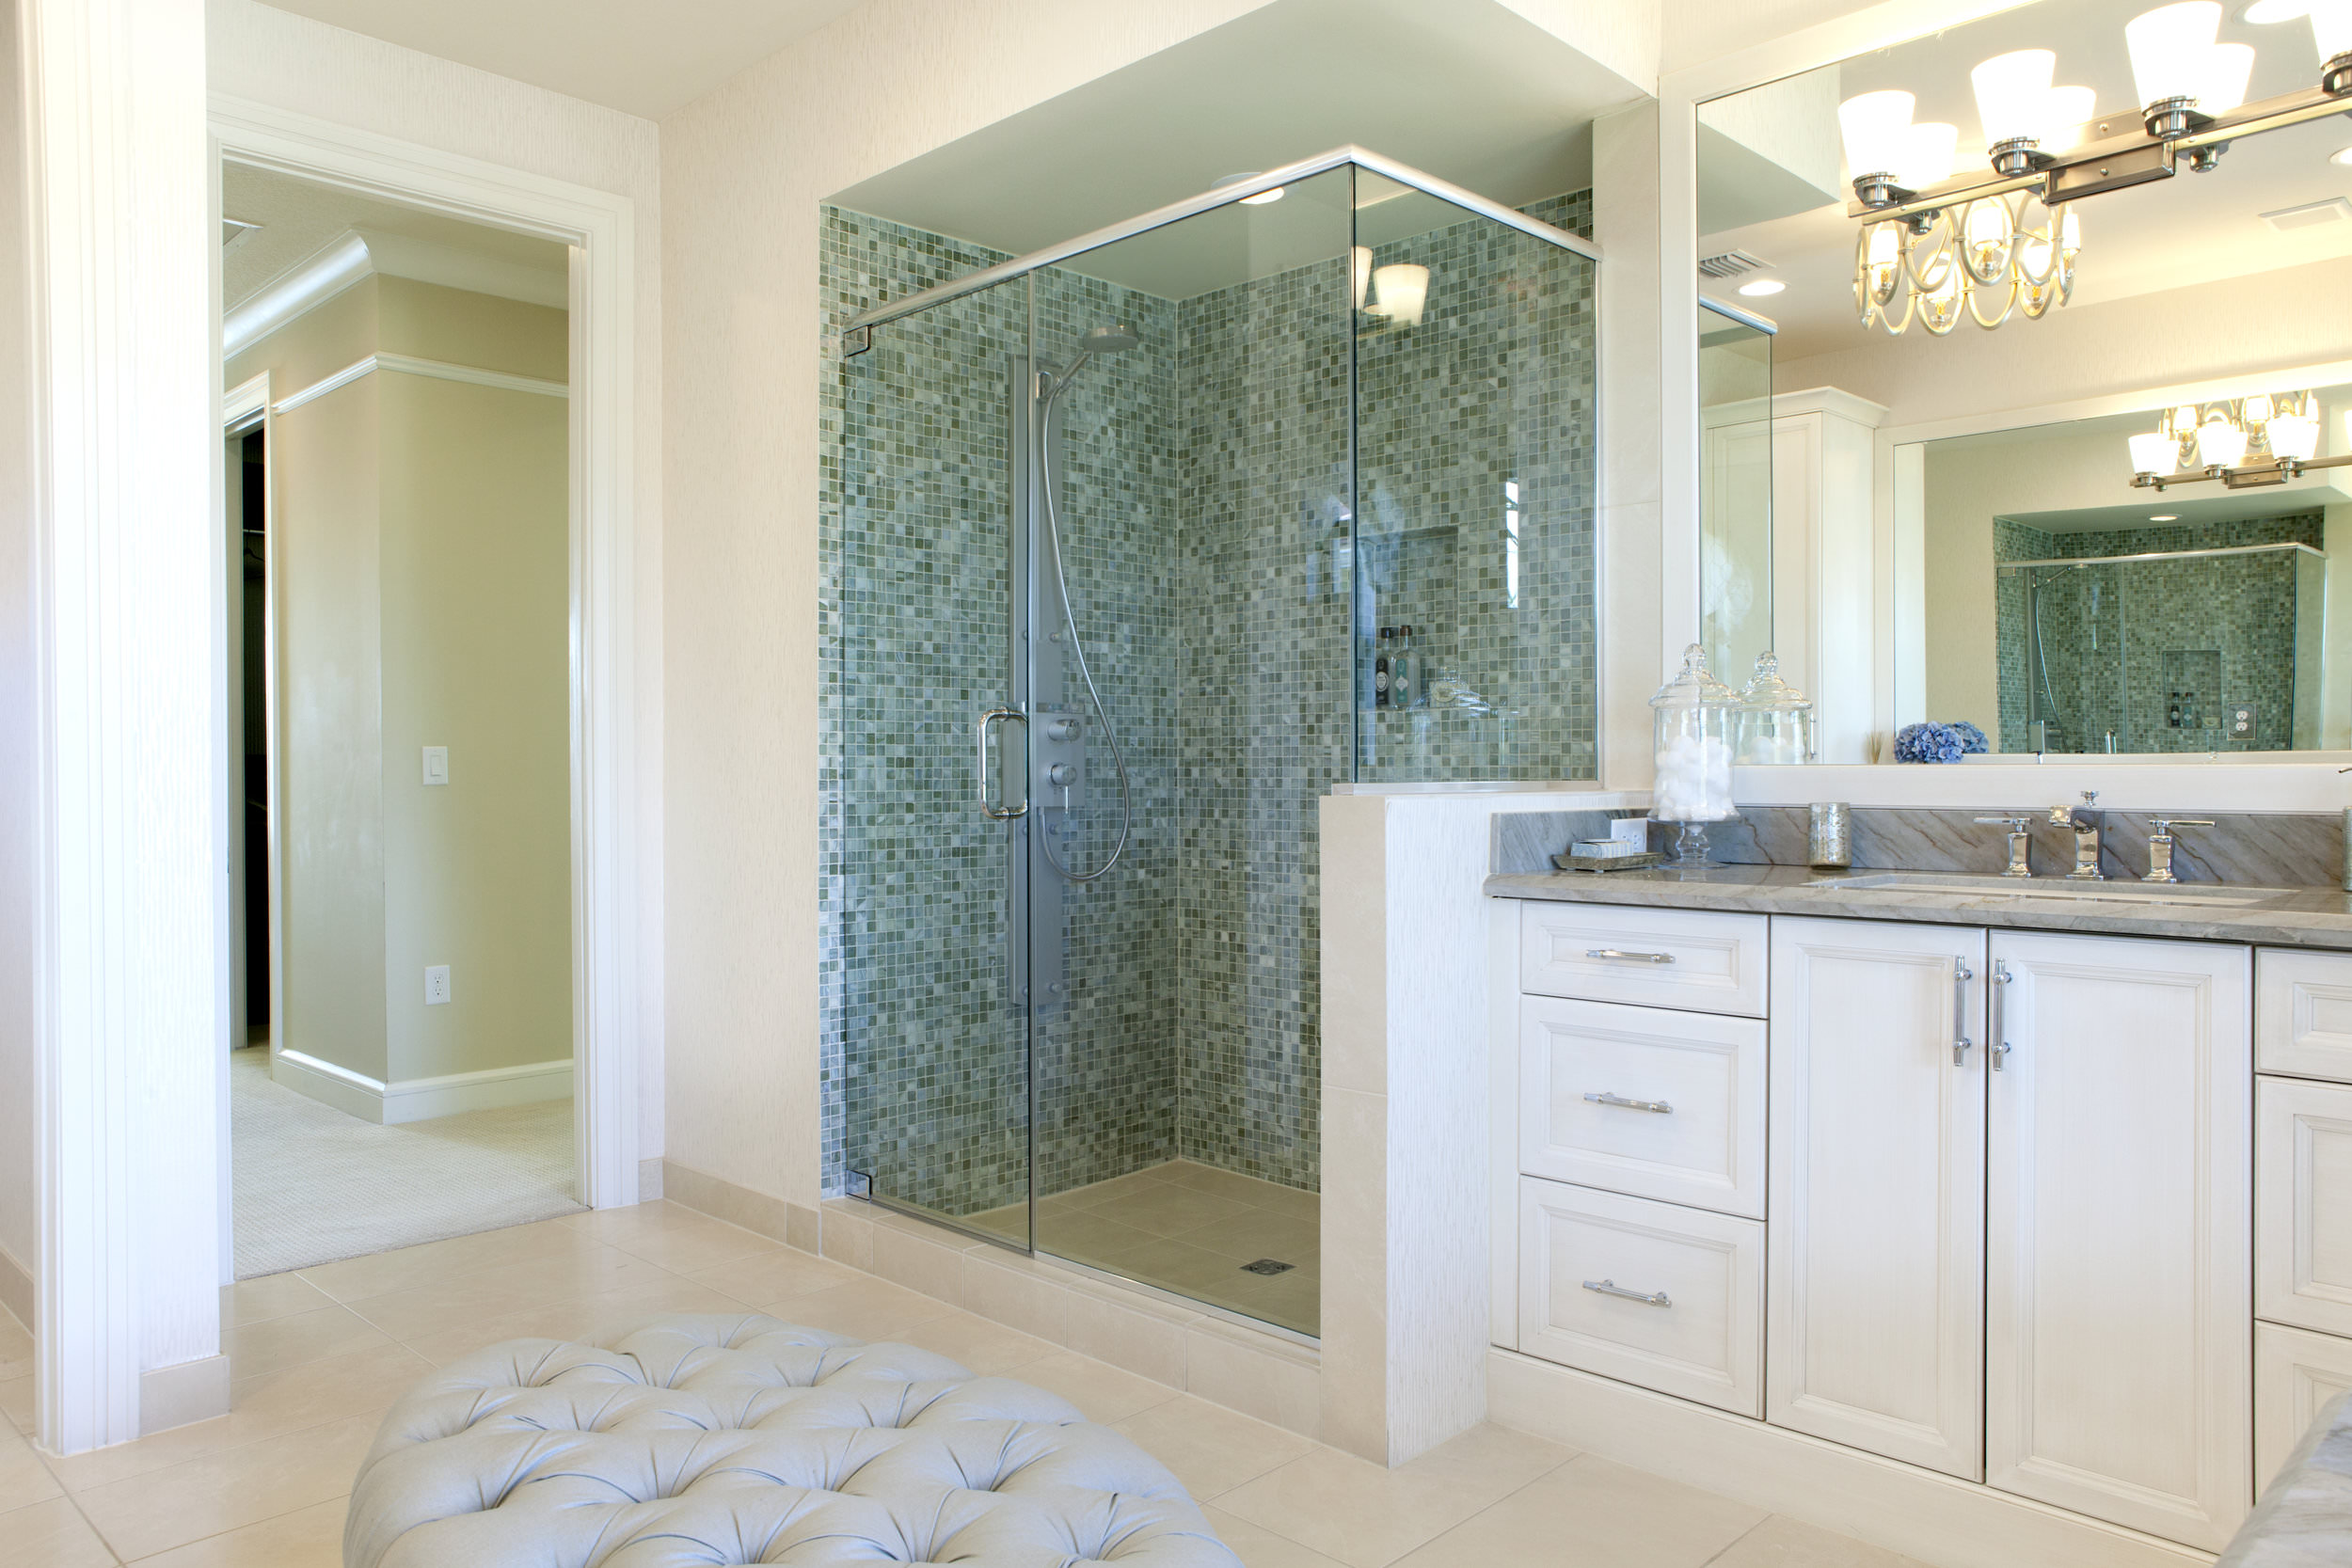 Bathroom remodel in Southern California